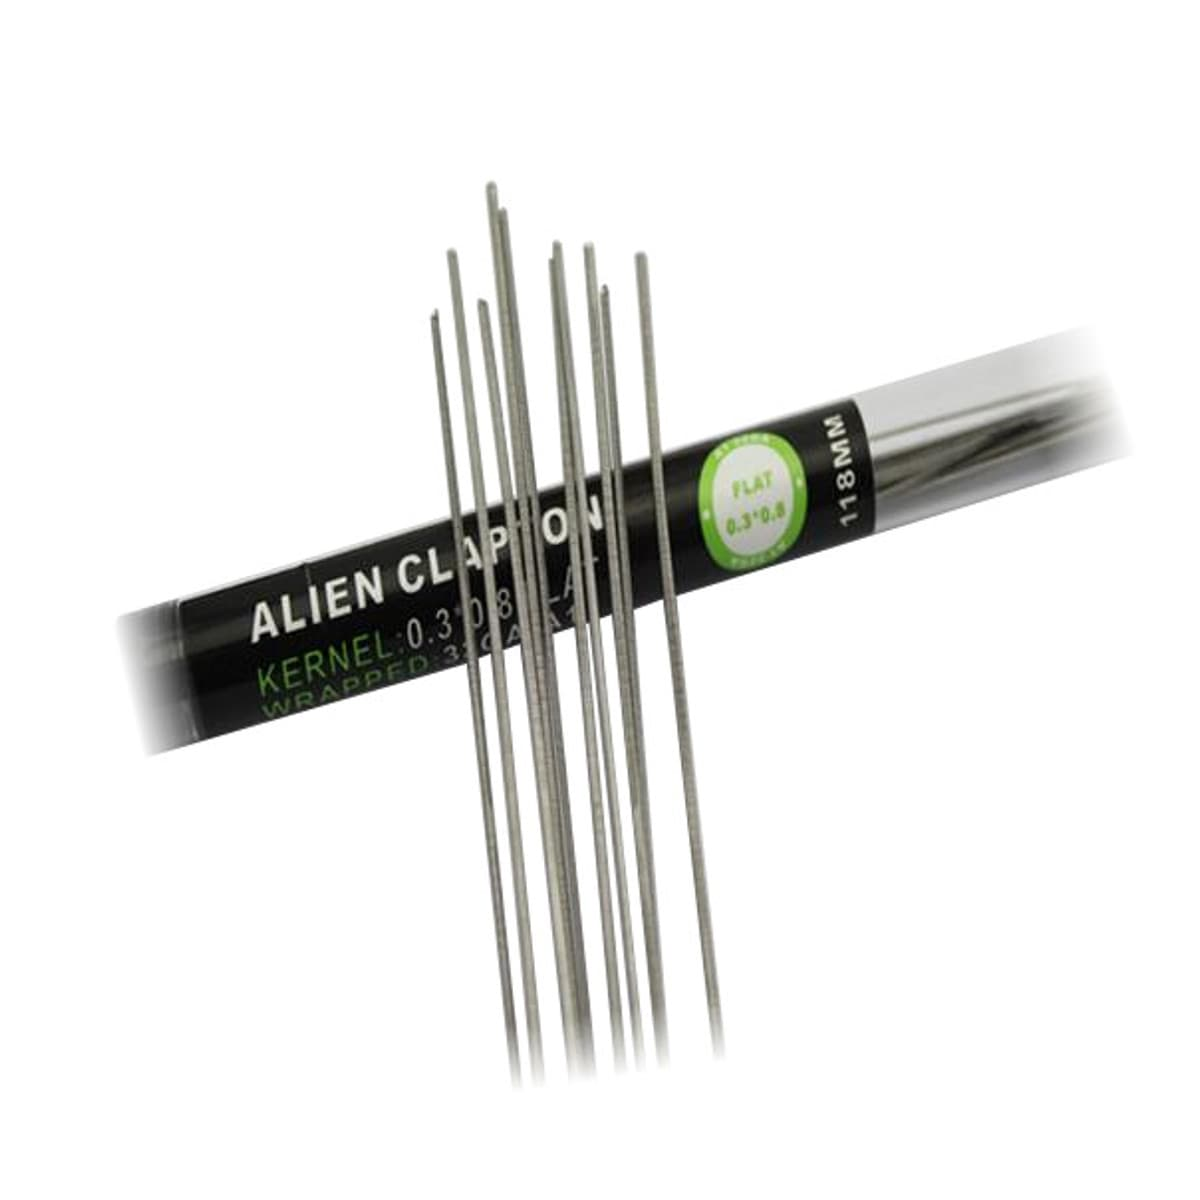 Alien Clapton Wire 25 Stk. je 15cm | MiBra-Shop